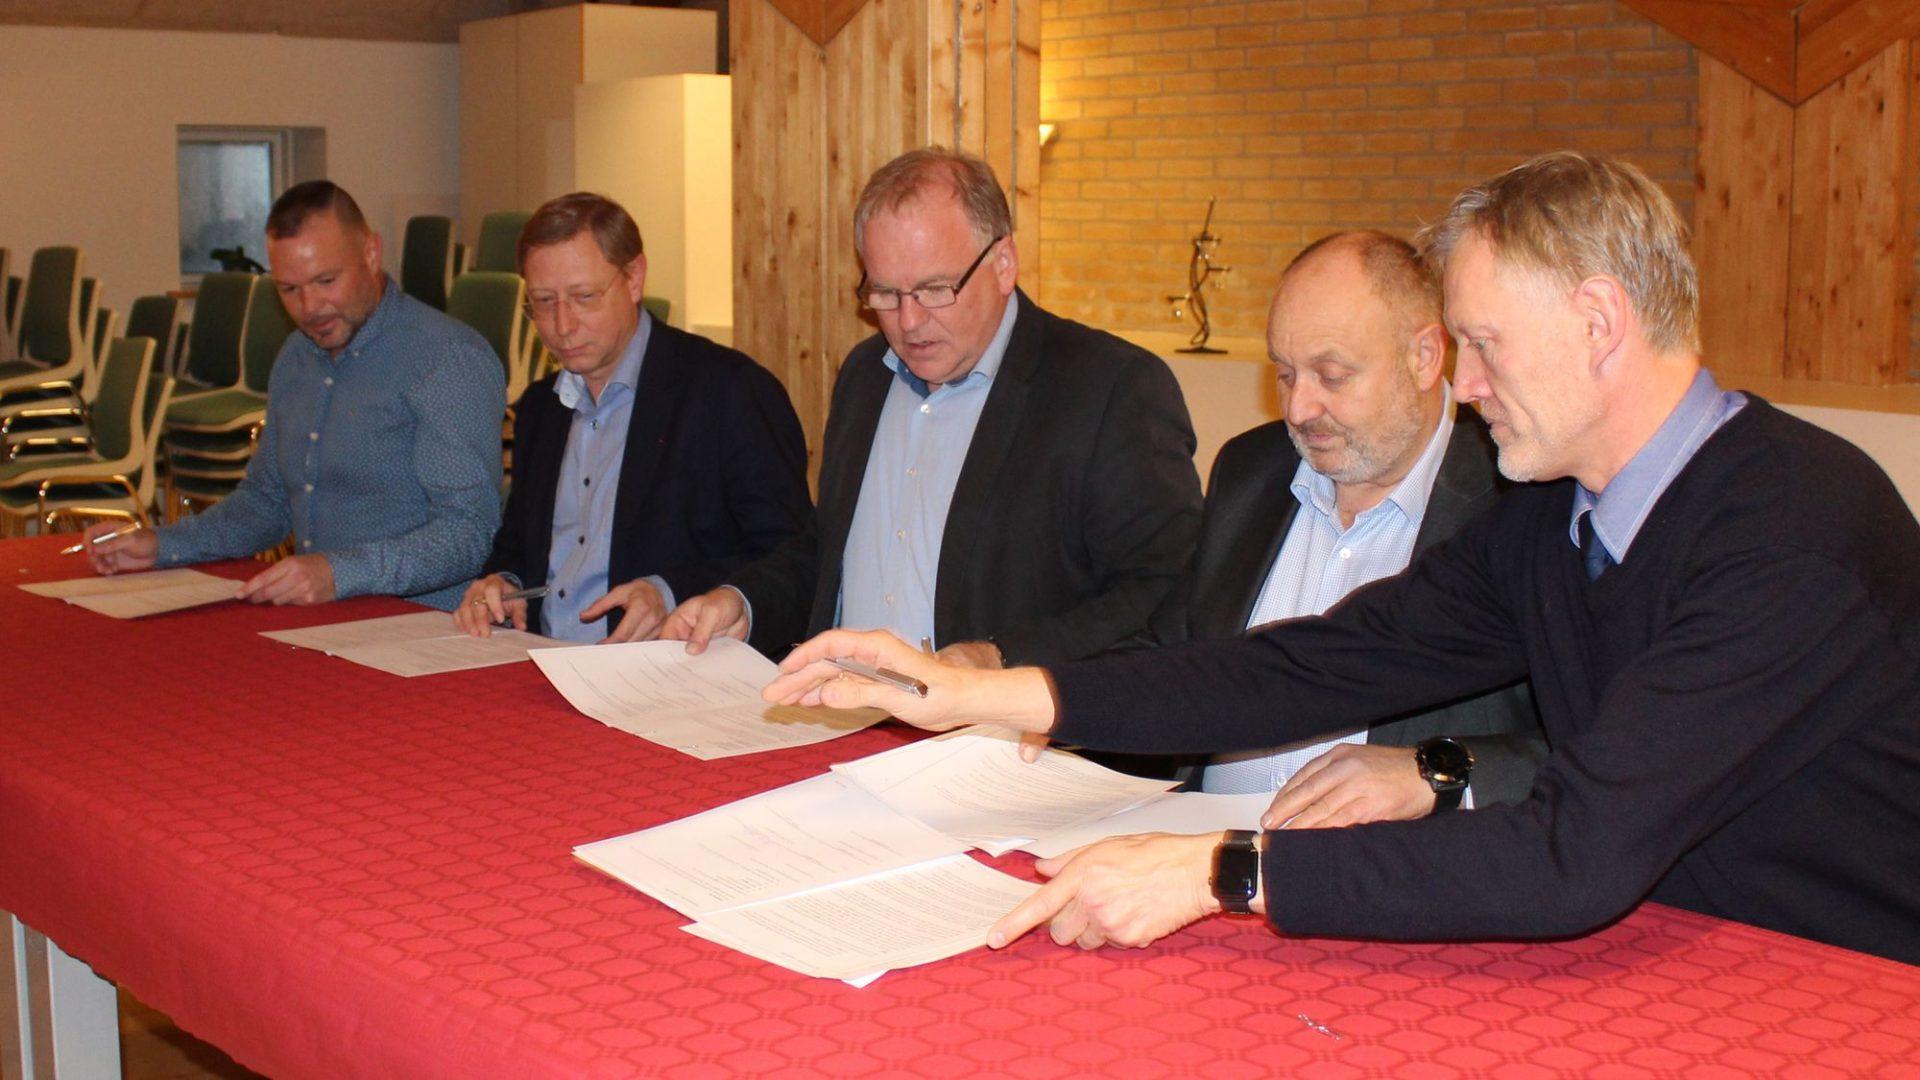 Partnerskabsaftalen i Odsherred bliver underskrevet